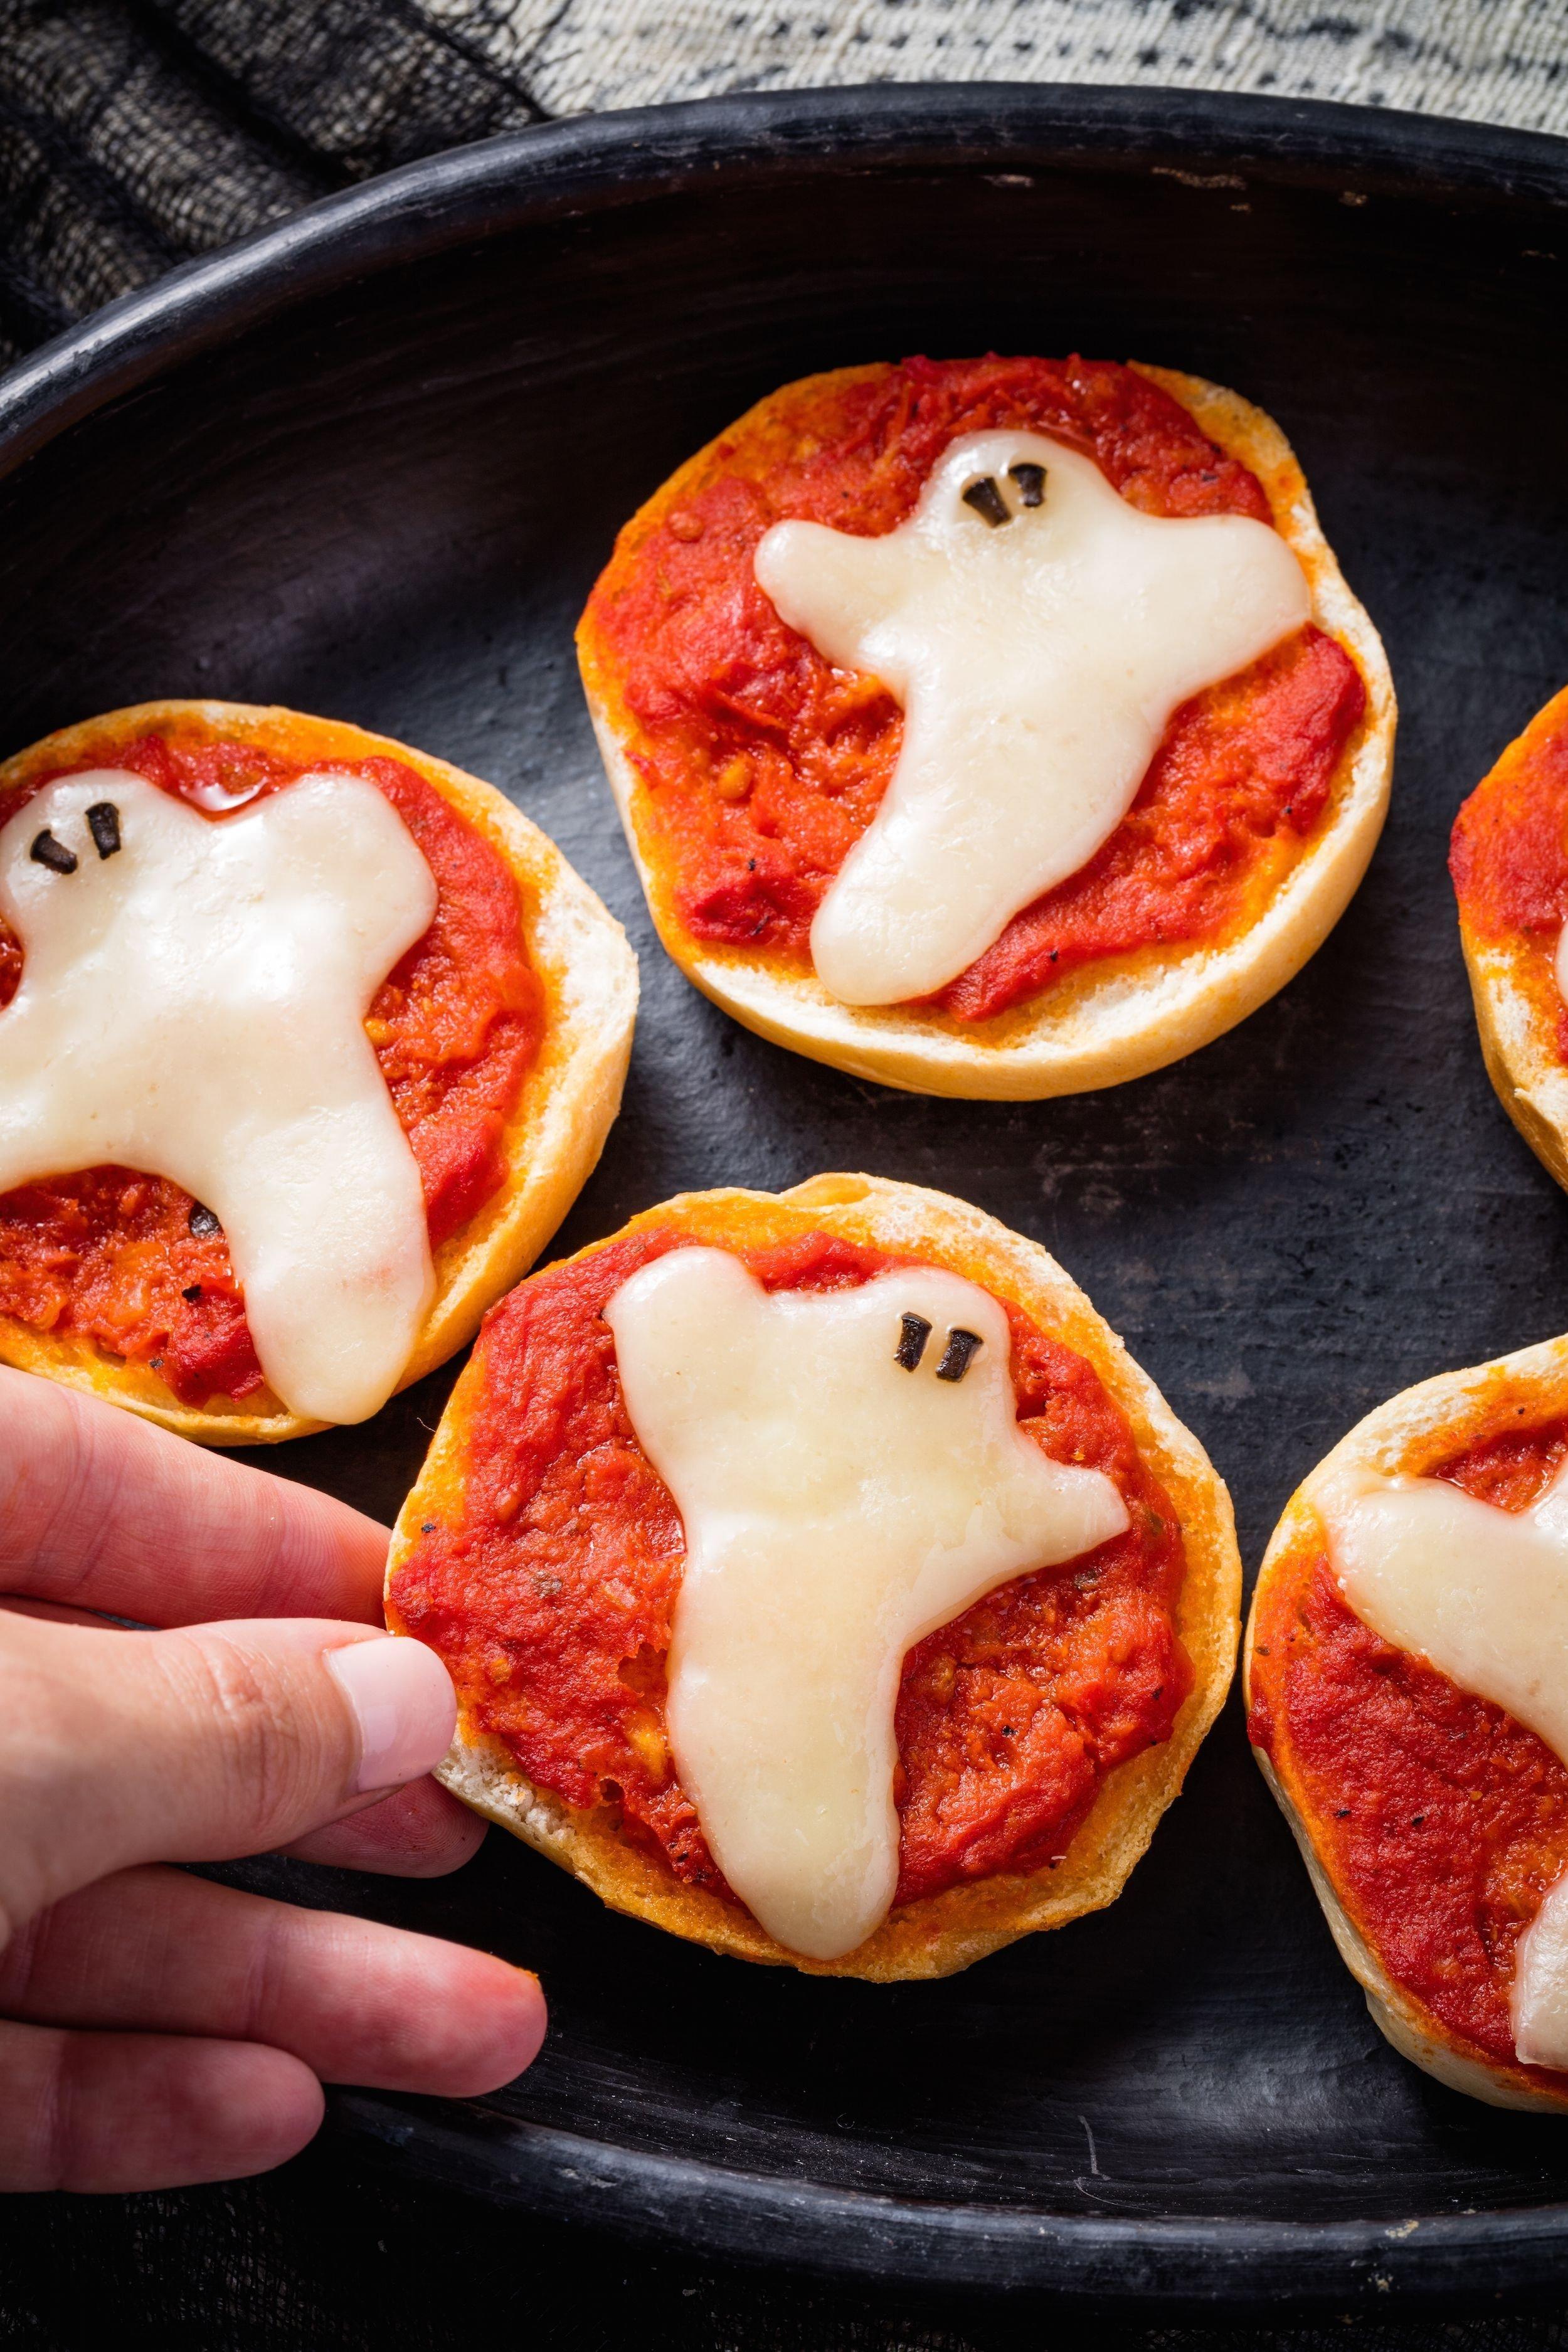 10 Great Kids Halloween Party Food Ideas 40 easy halloween party treat ideas best recipes for halloween 2020